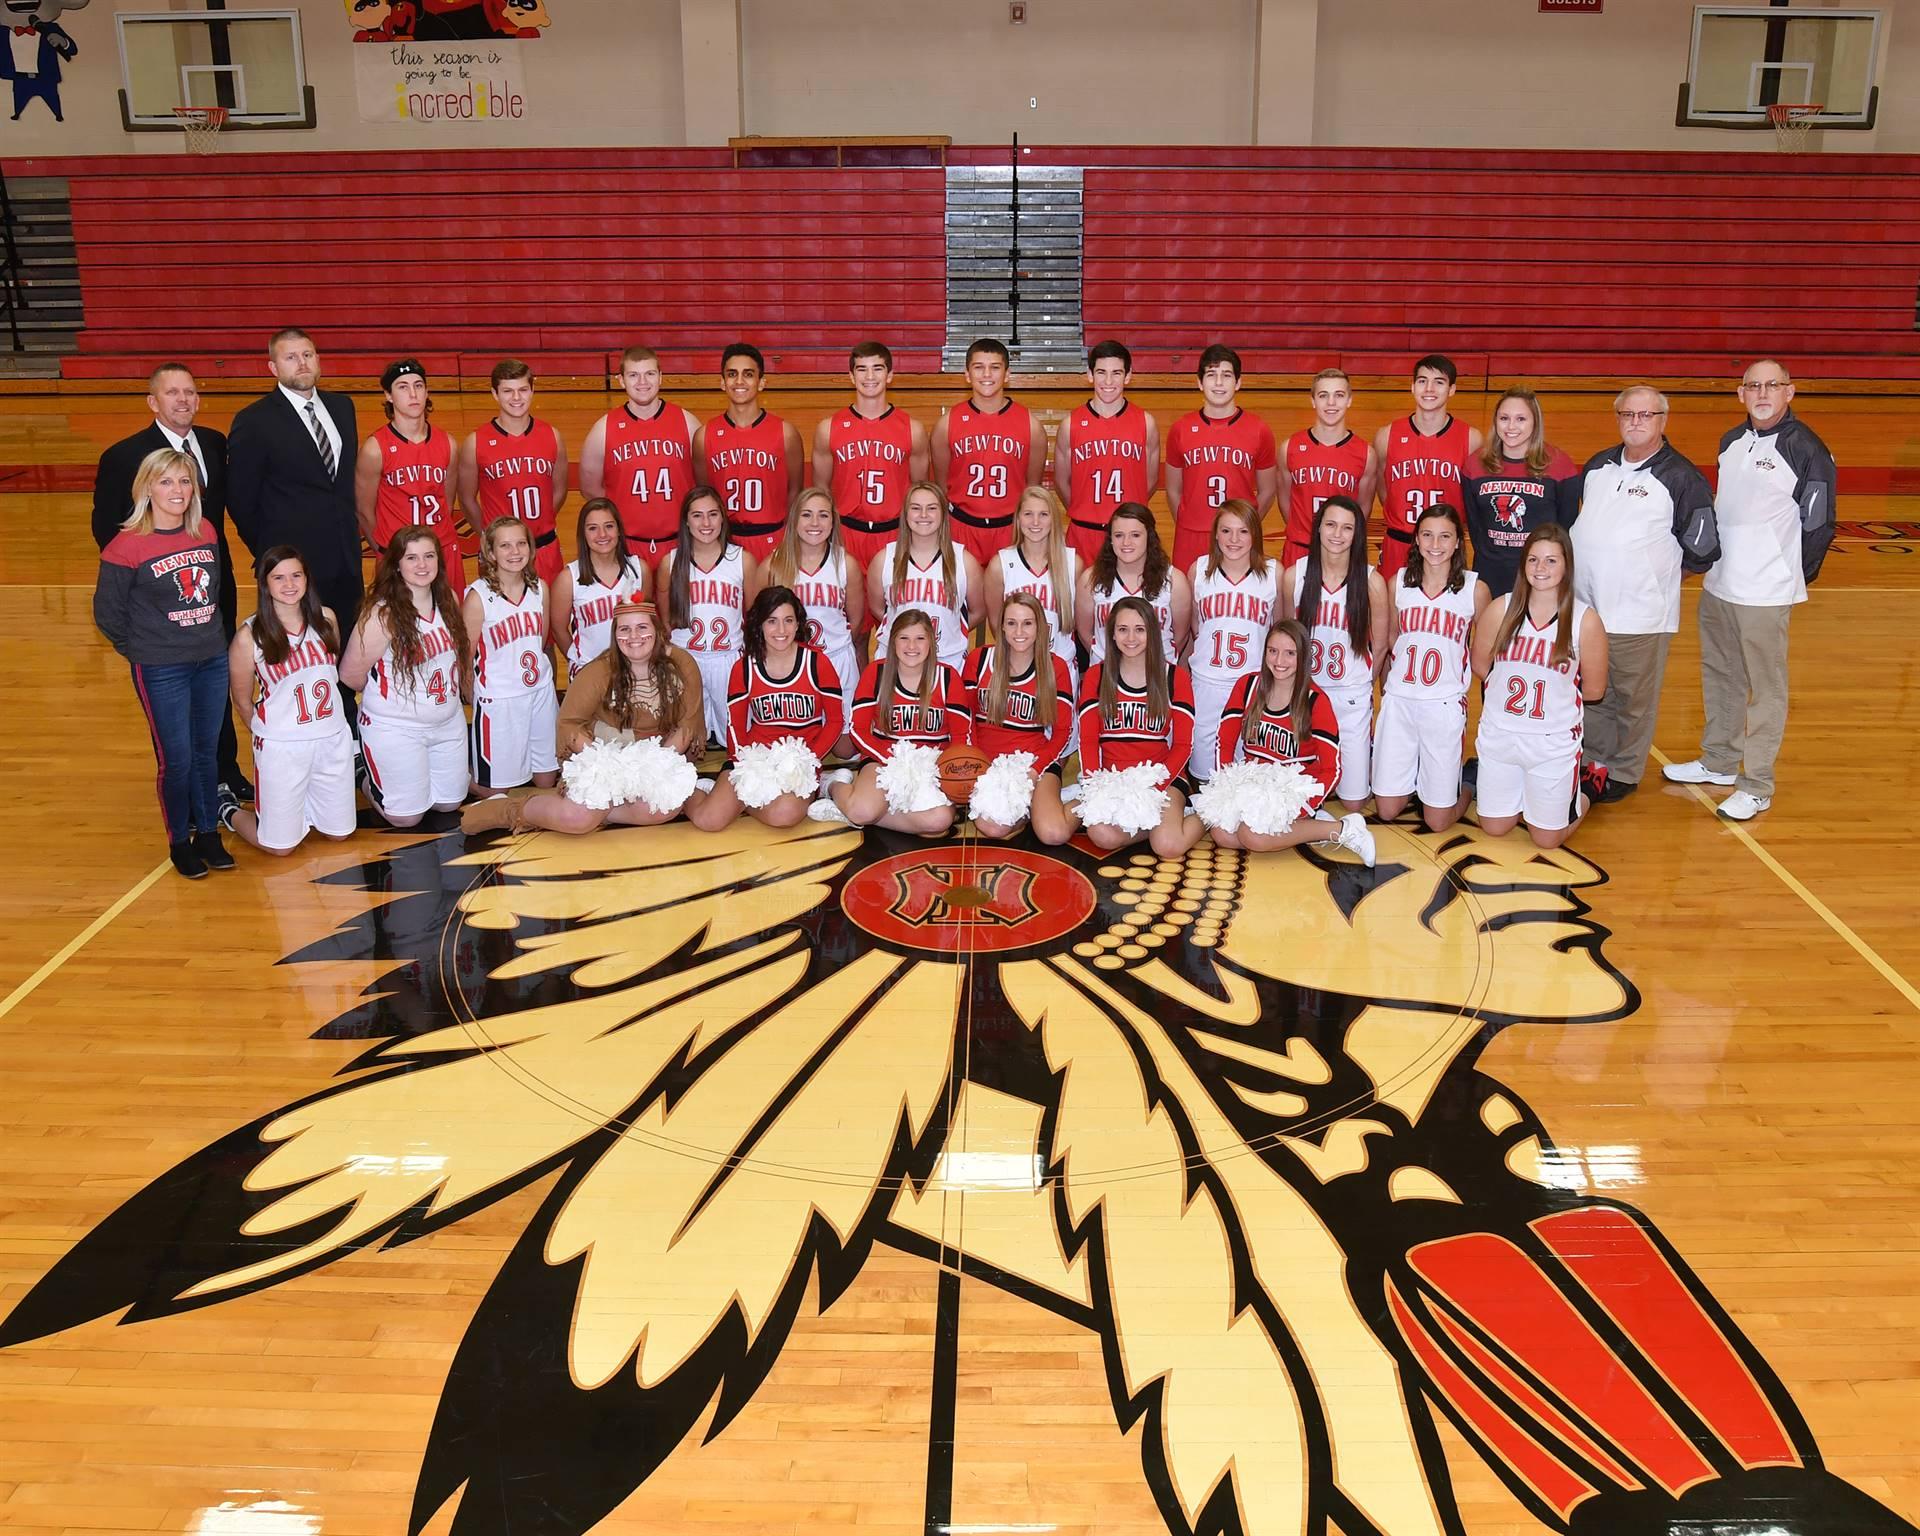 Newton Varsity Basket Ball Teams and Cheerleaders